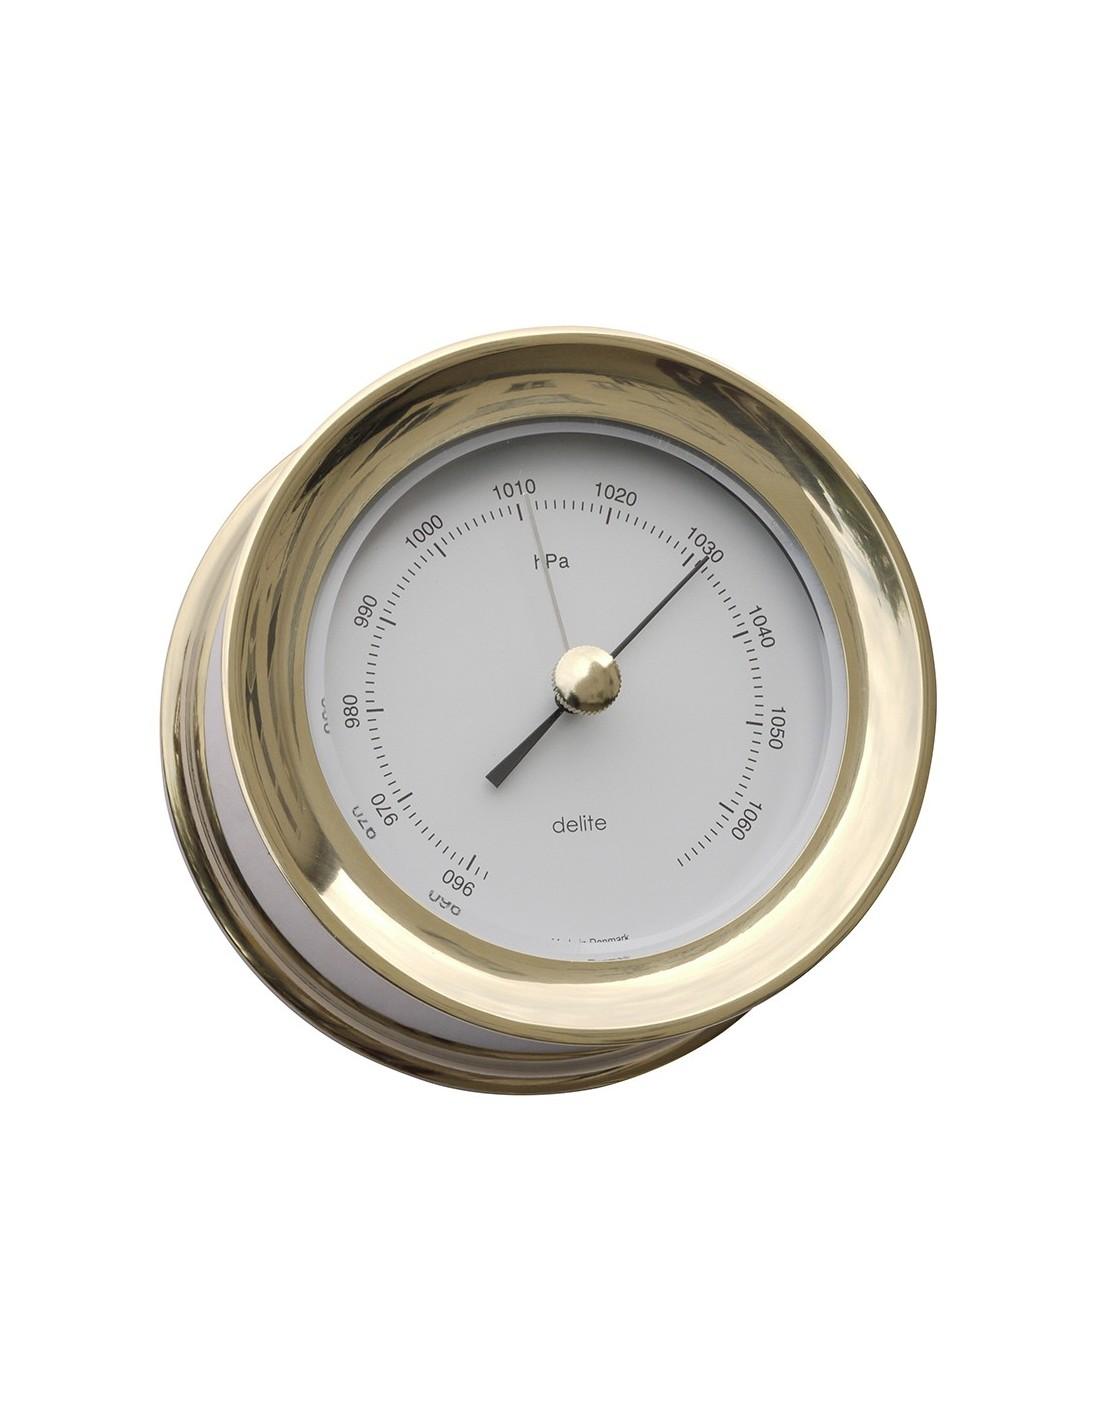 Zealand Barometer - Messing - 110 mm - Delite - Scheepsinstrumenten - 630150